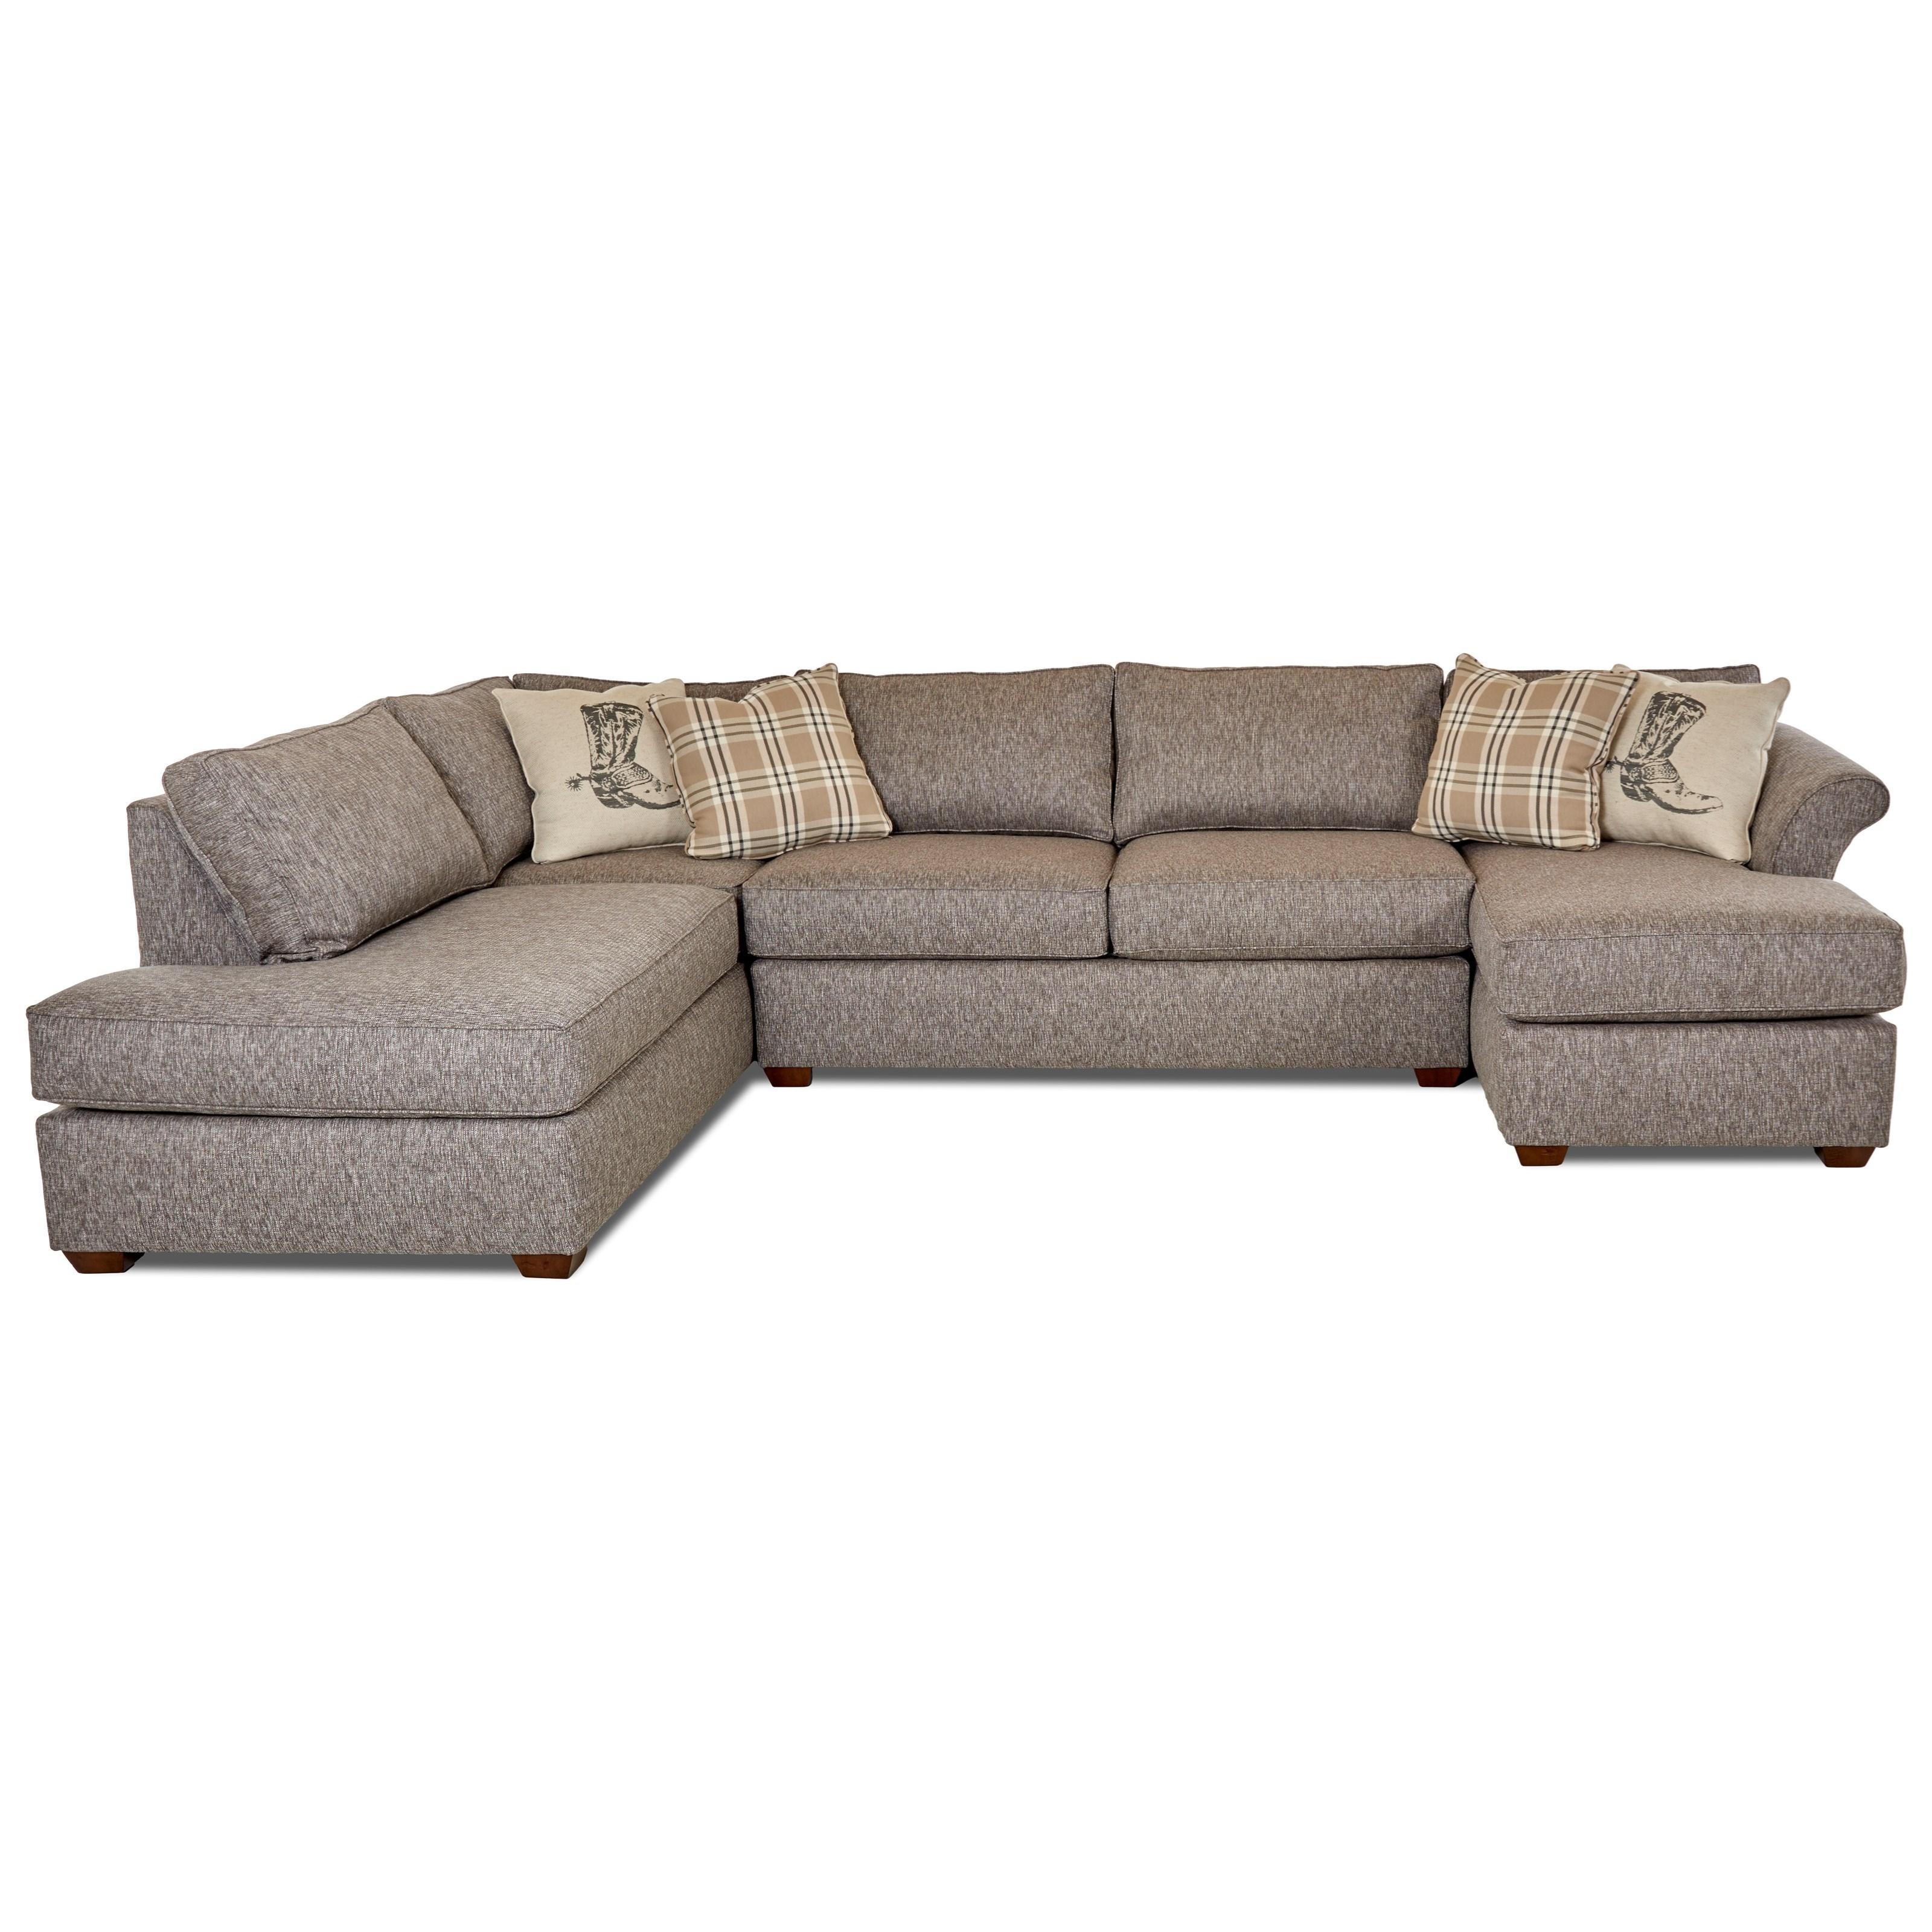 Klaussner jaxon three piece sectional sofa with flared for 3 piece sectional sofas with chaise